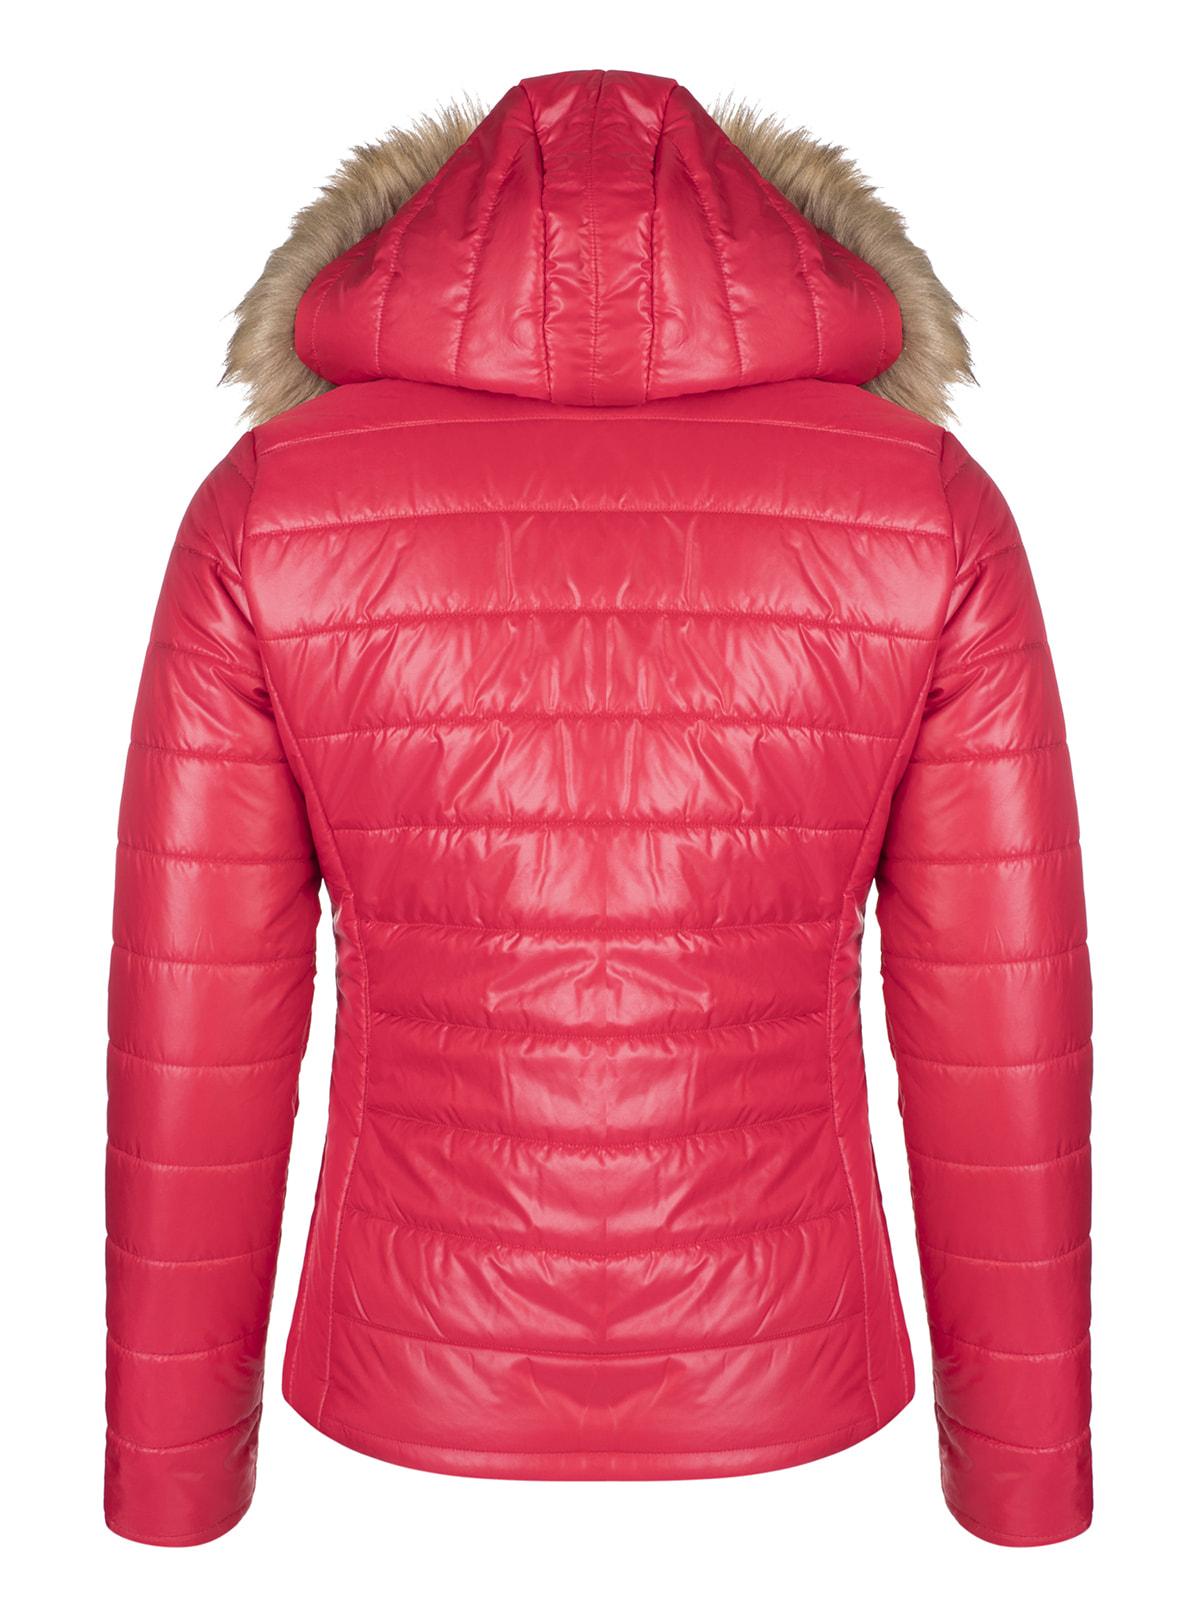 Куртка червона | 4692148 | фото 4